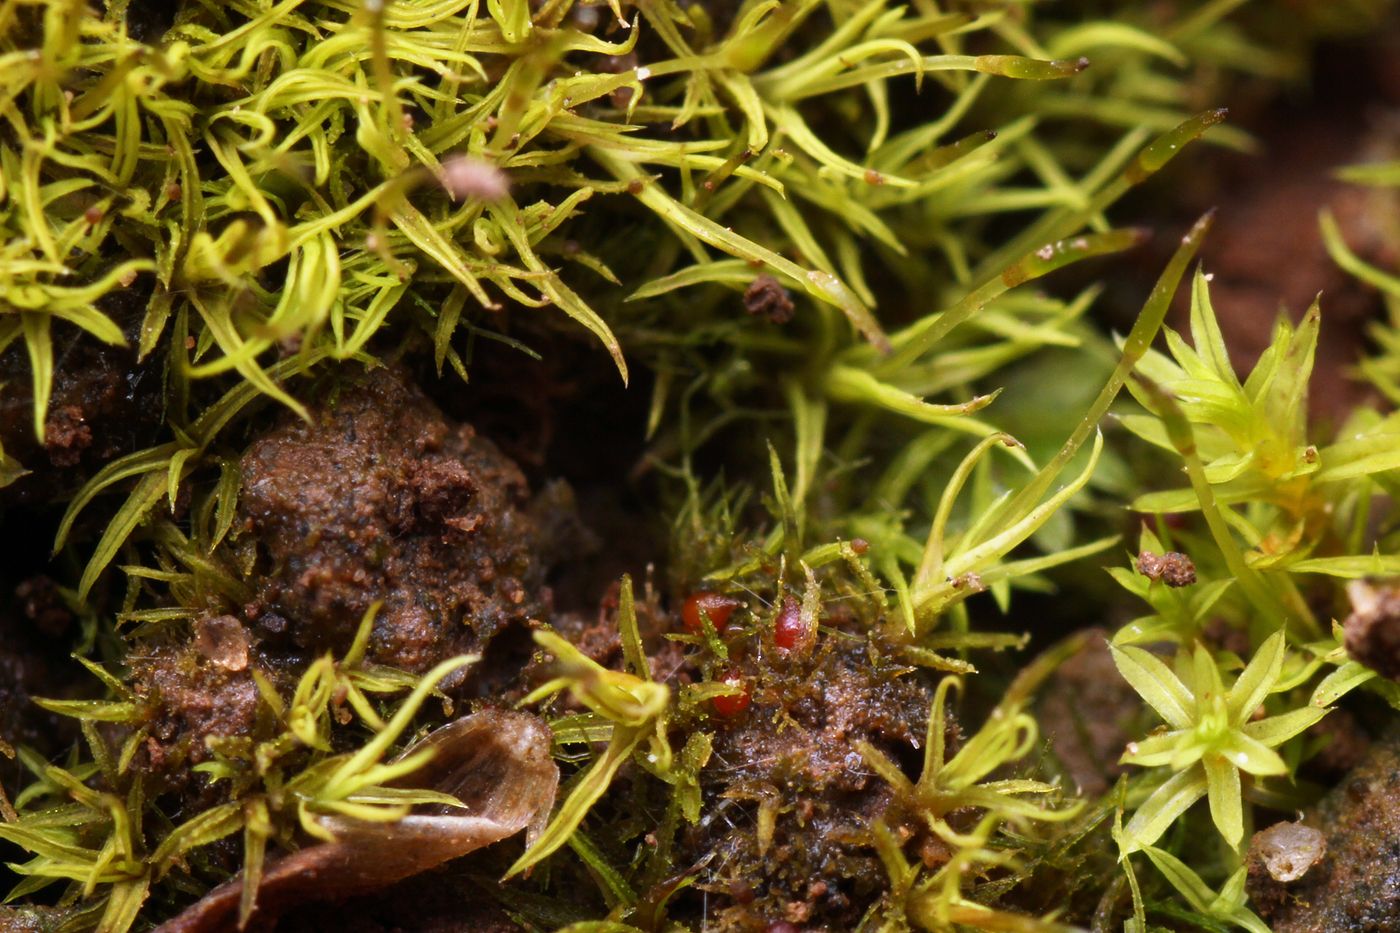 South Wales Bryophytes: Miniature garden flora